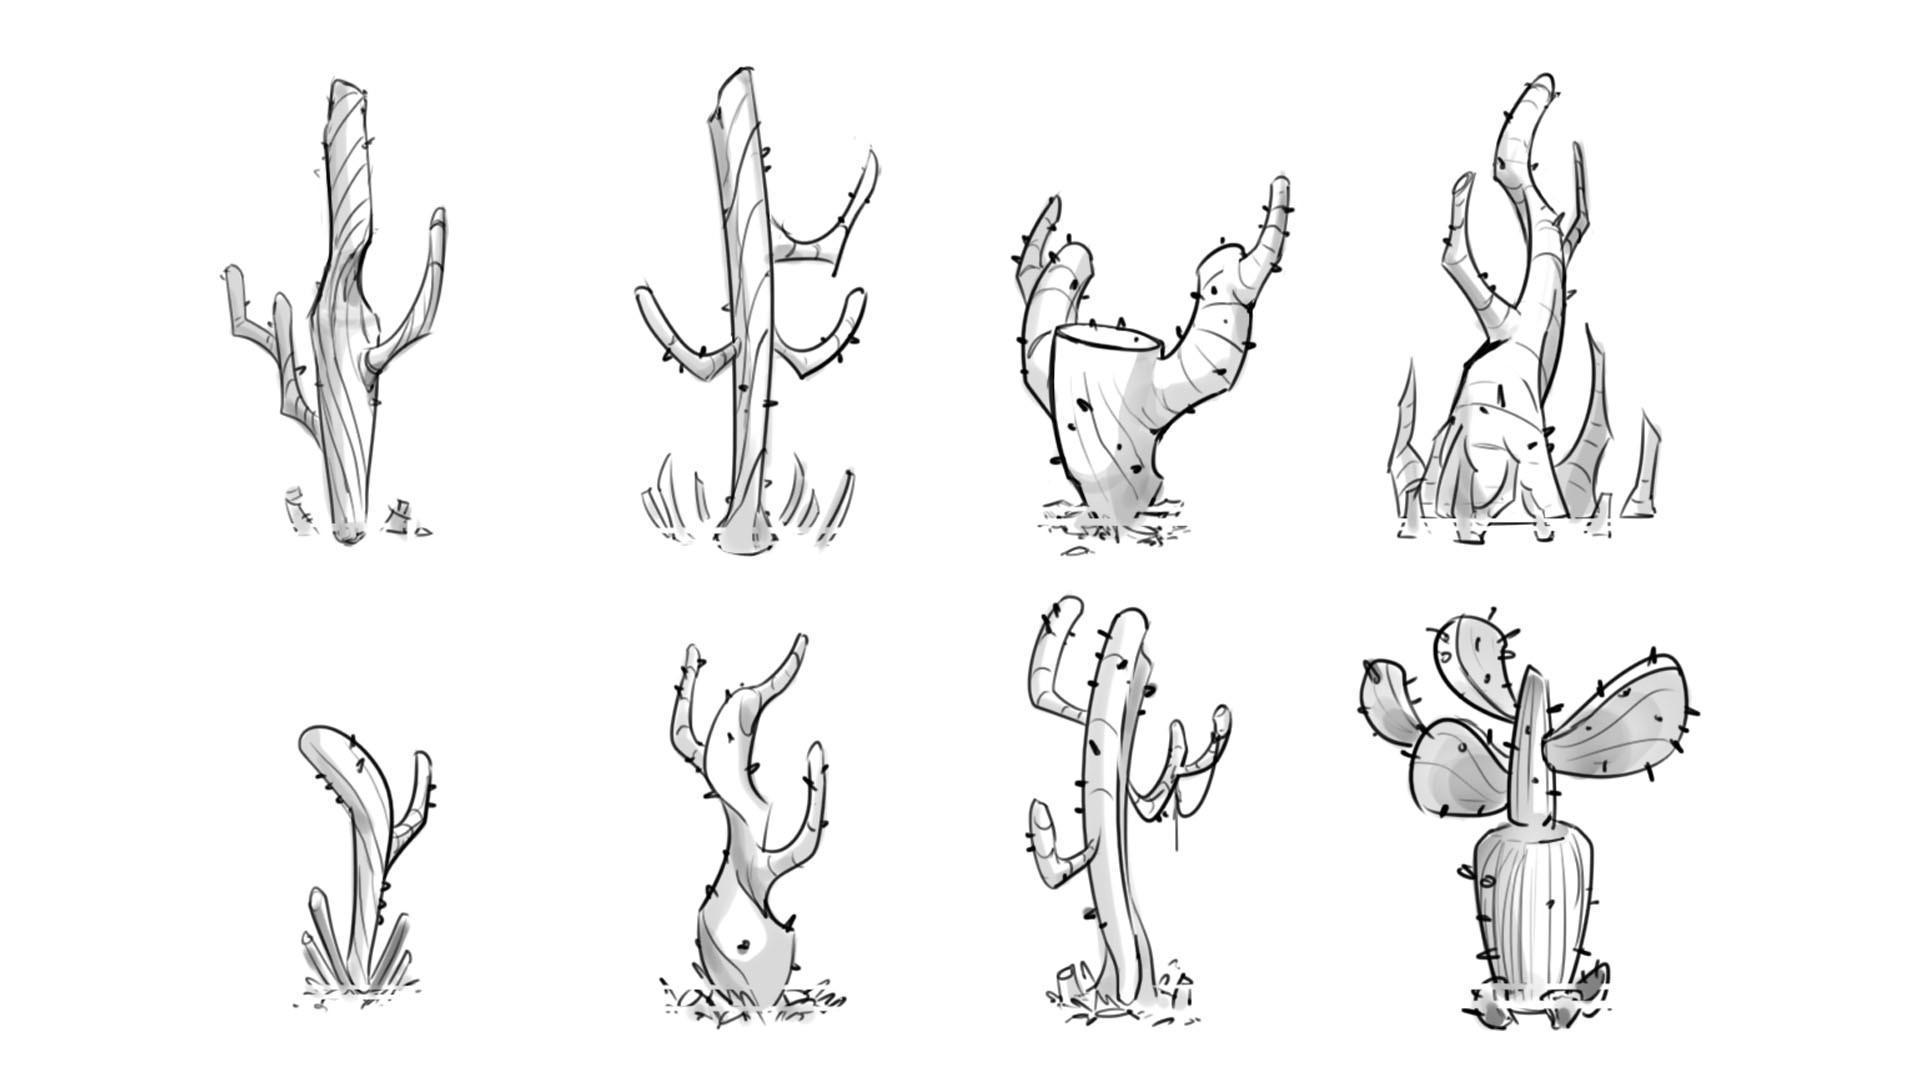 Sandra grunberg sphere cactus